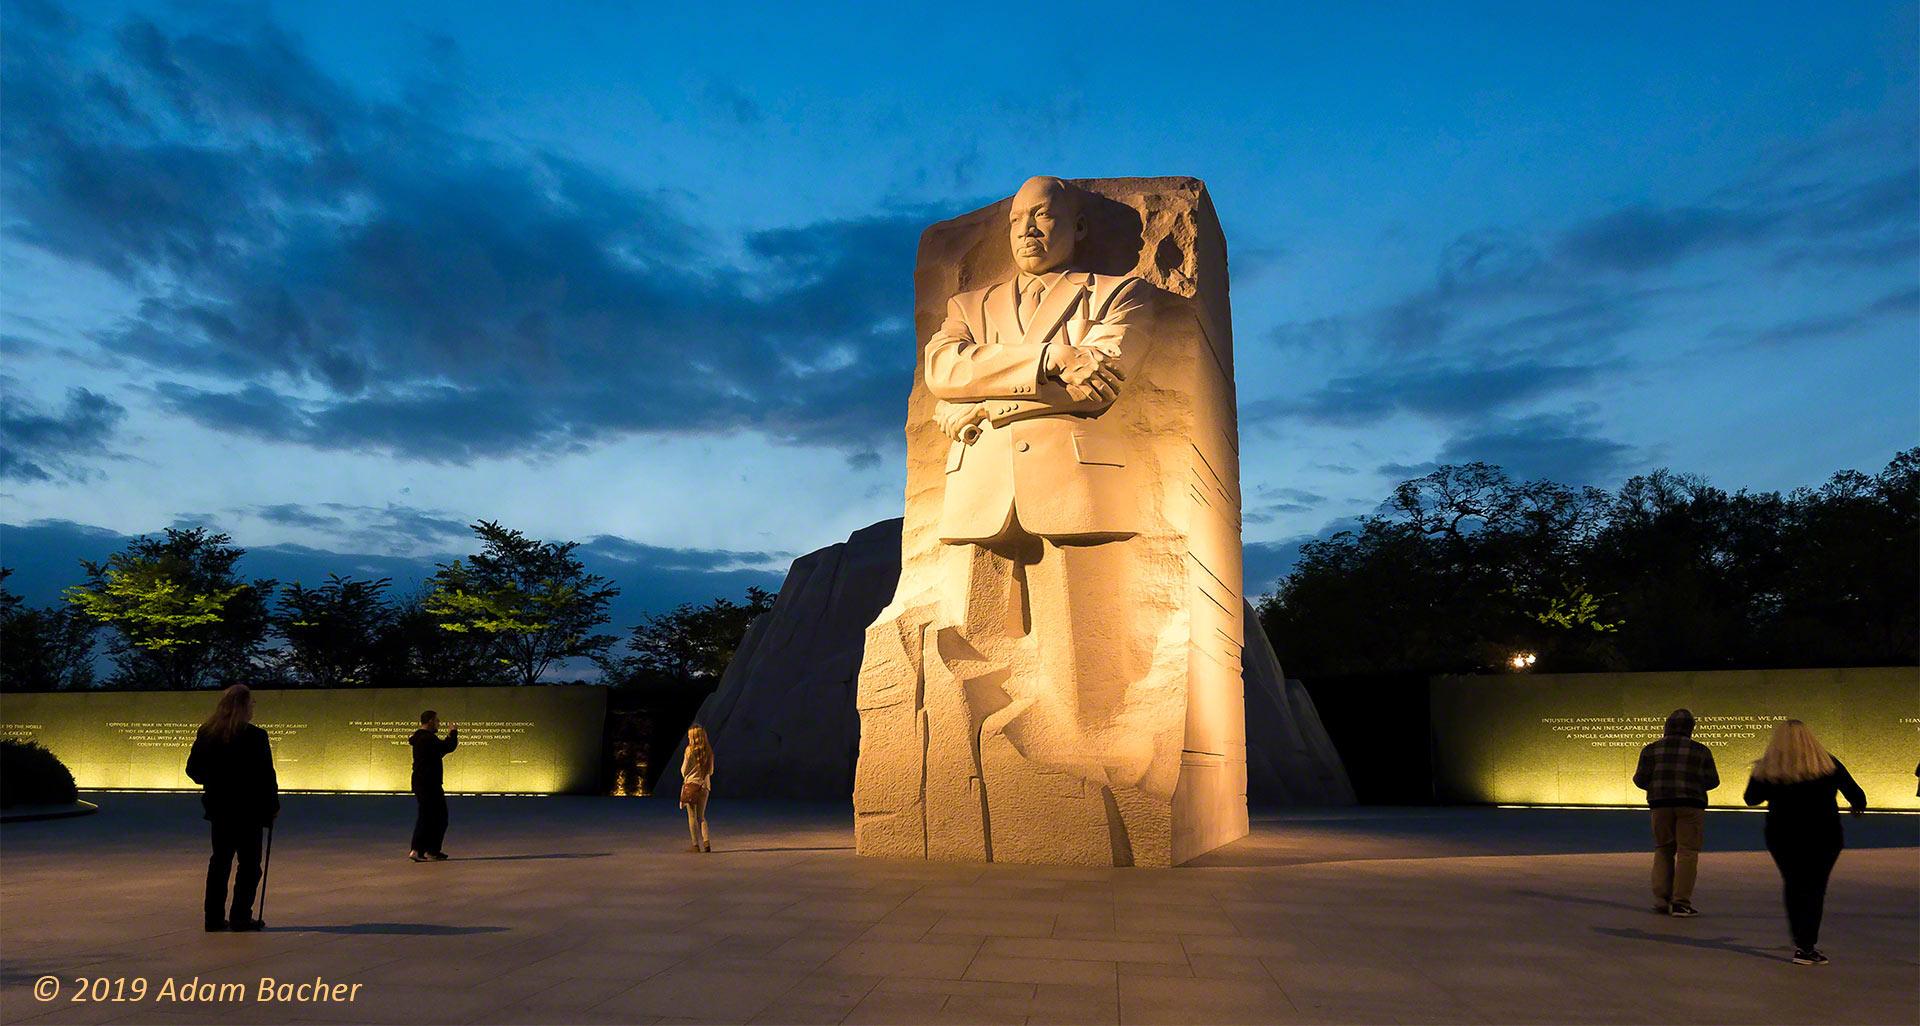 Monuments on the National Mall – Washington DC